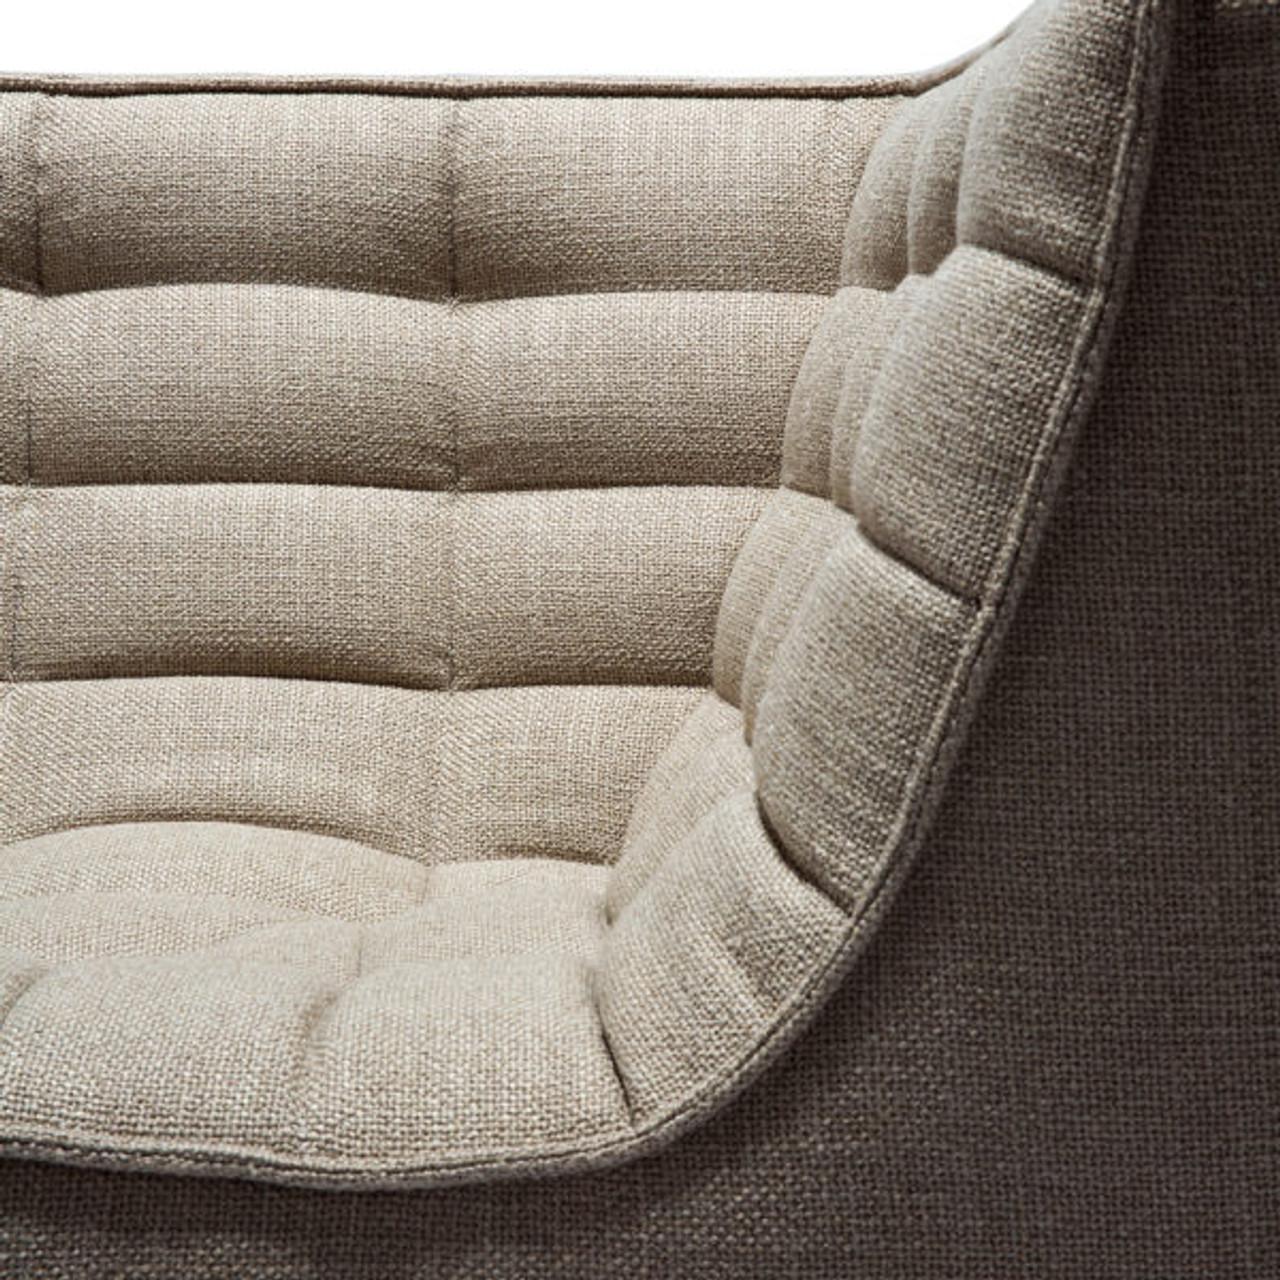 Roset Modular Sectional Sofa - Square Corner